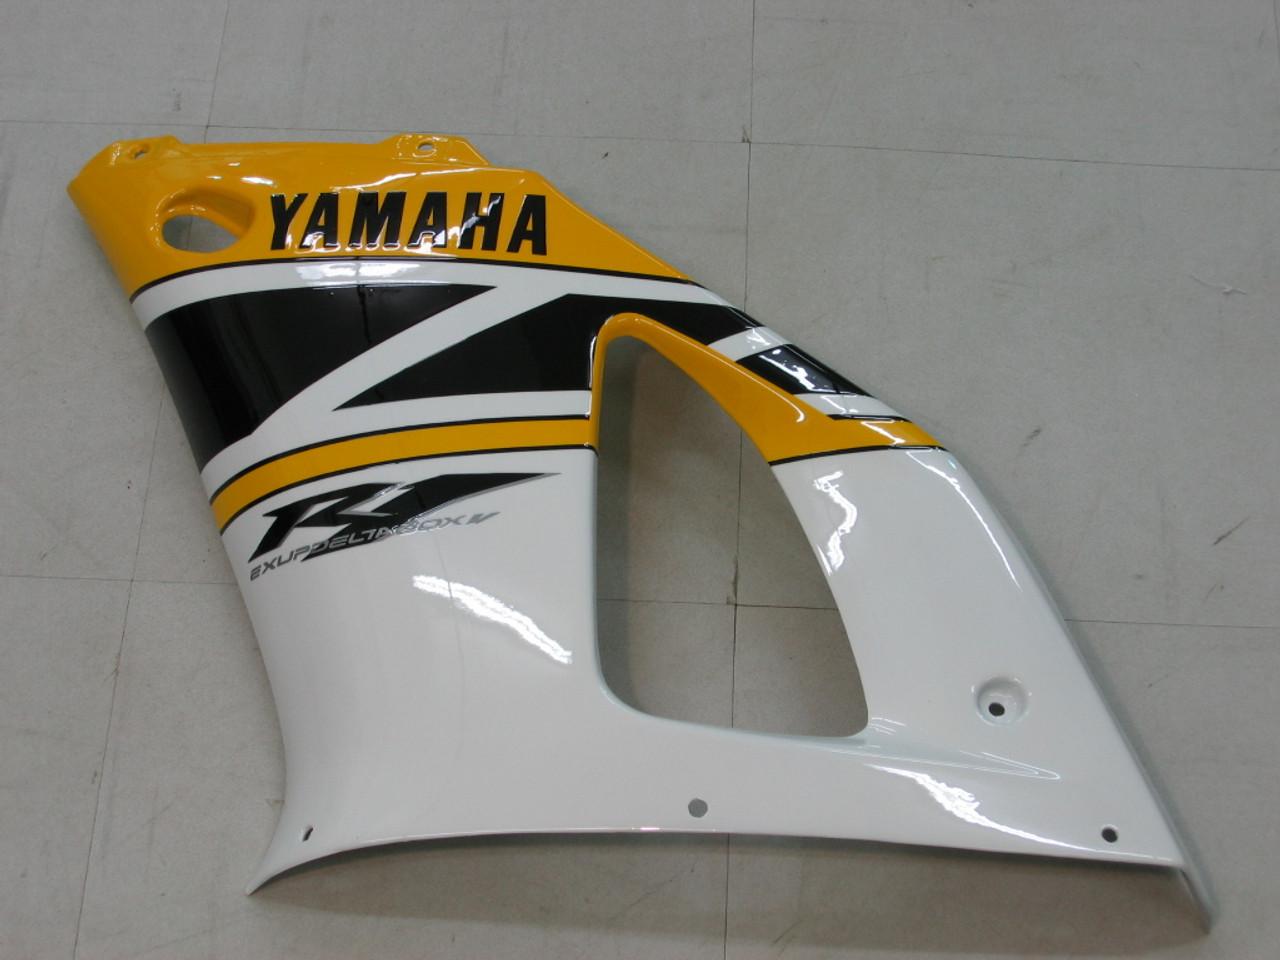 Fairings Yamaha YZF-R1 Yellow White Black R1 Racing (1998-1999)